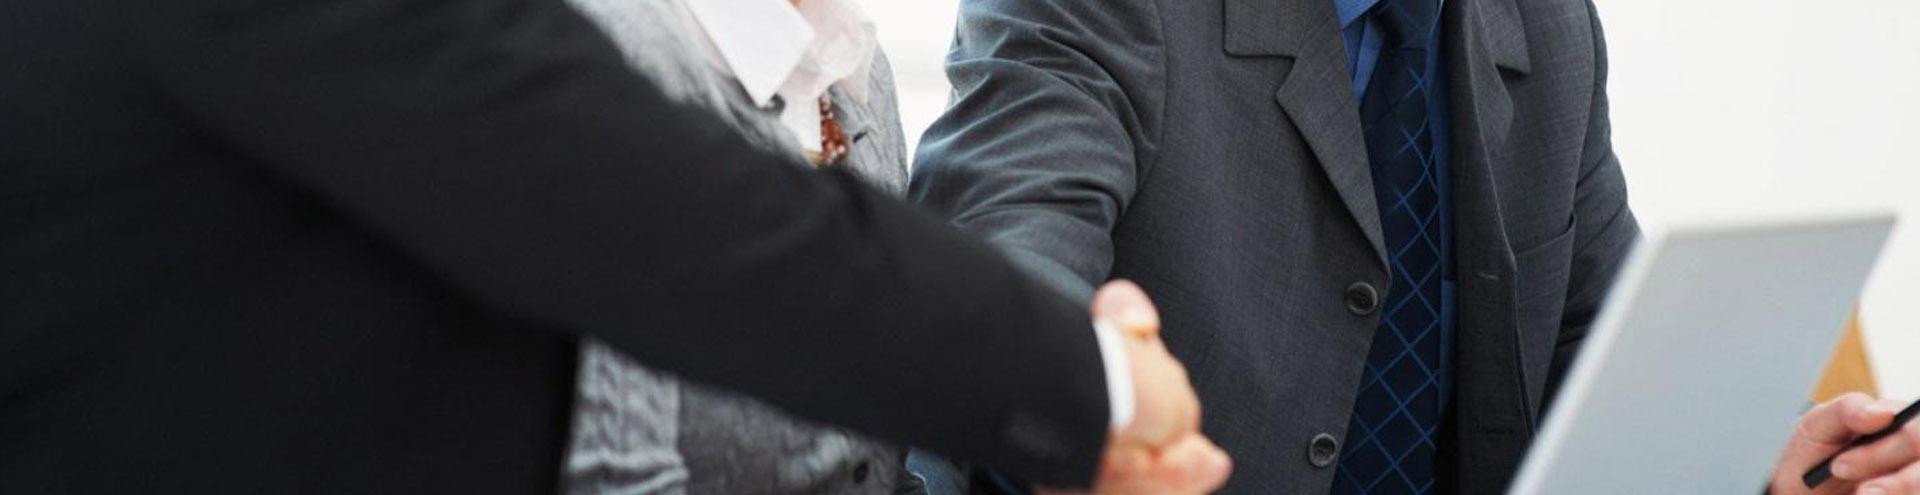 консультация юриста в Пензе